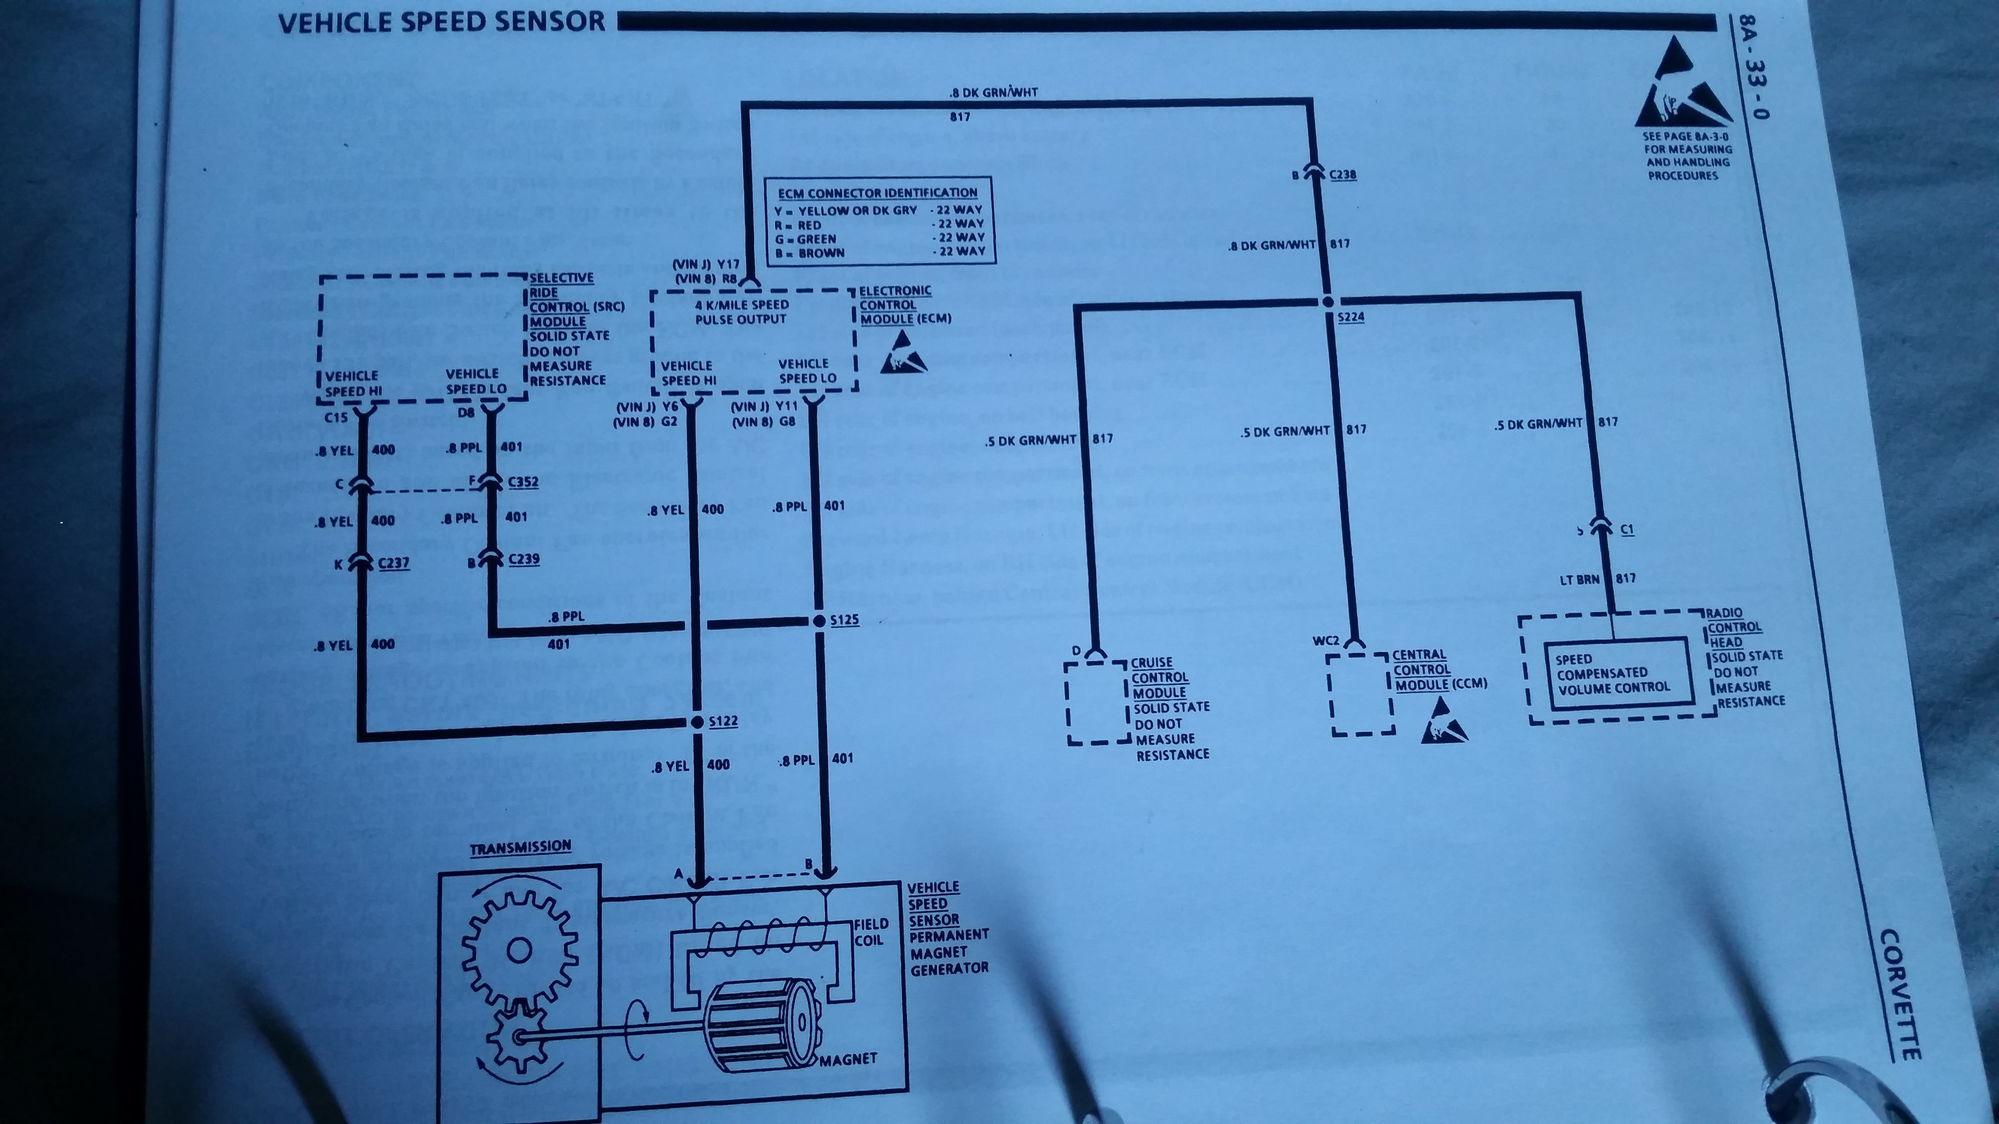 Hooking up spedometer signal help - CorvetteForum - Chevrolet ...